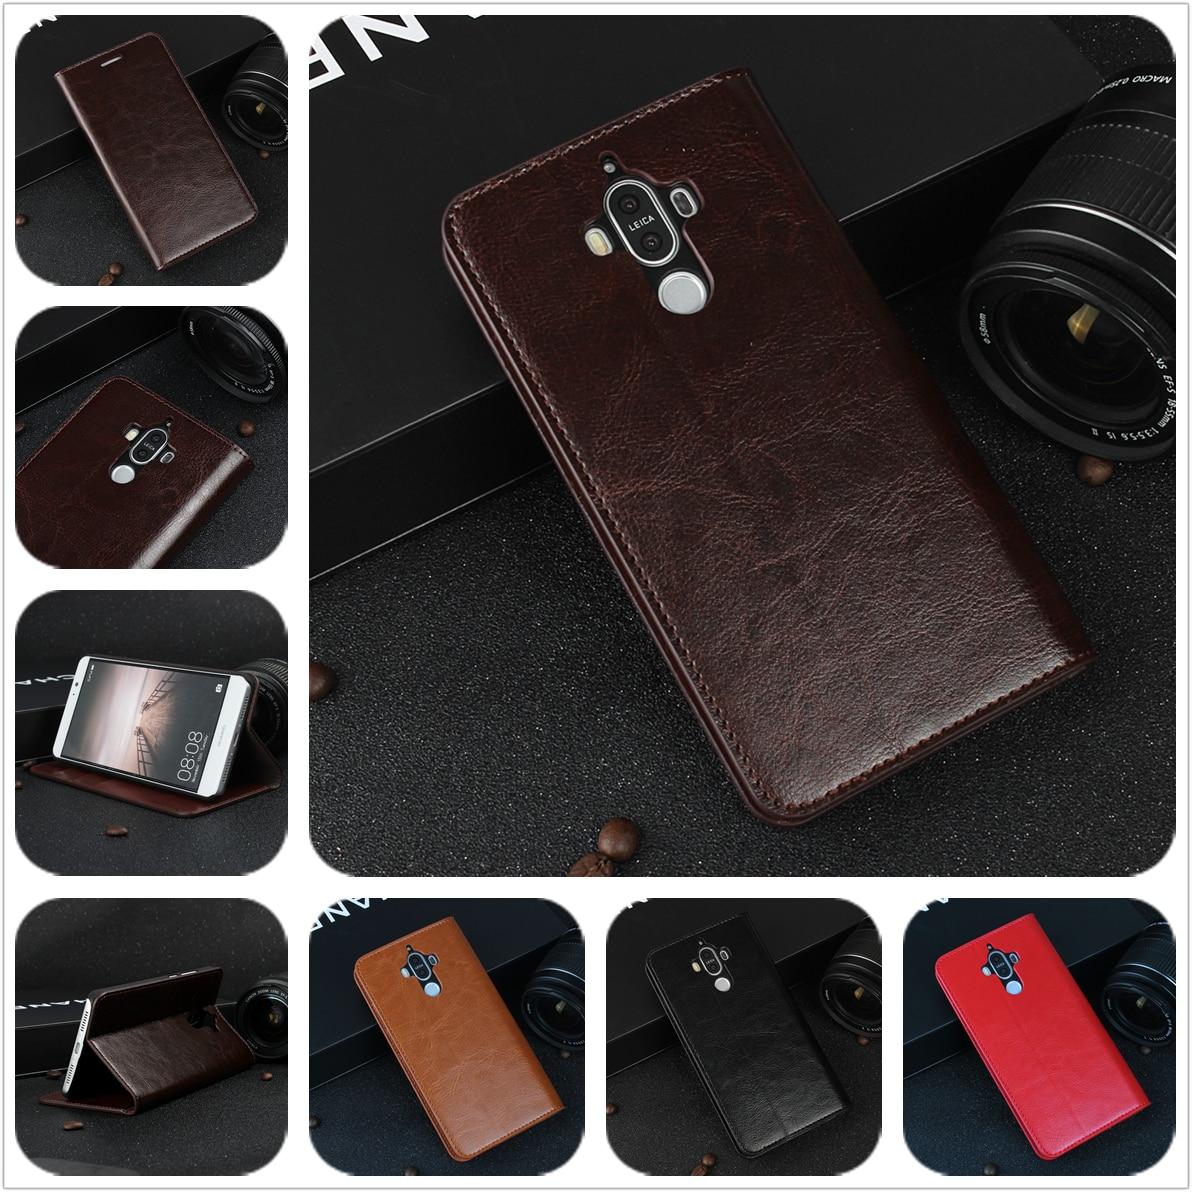 Цена за Люкс бумажник чехол для Huawei Ascend Коврики 9 Премиум кожаный чехол флип чехол для Huawei Коврики 9 телефон Сумки